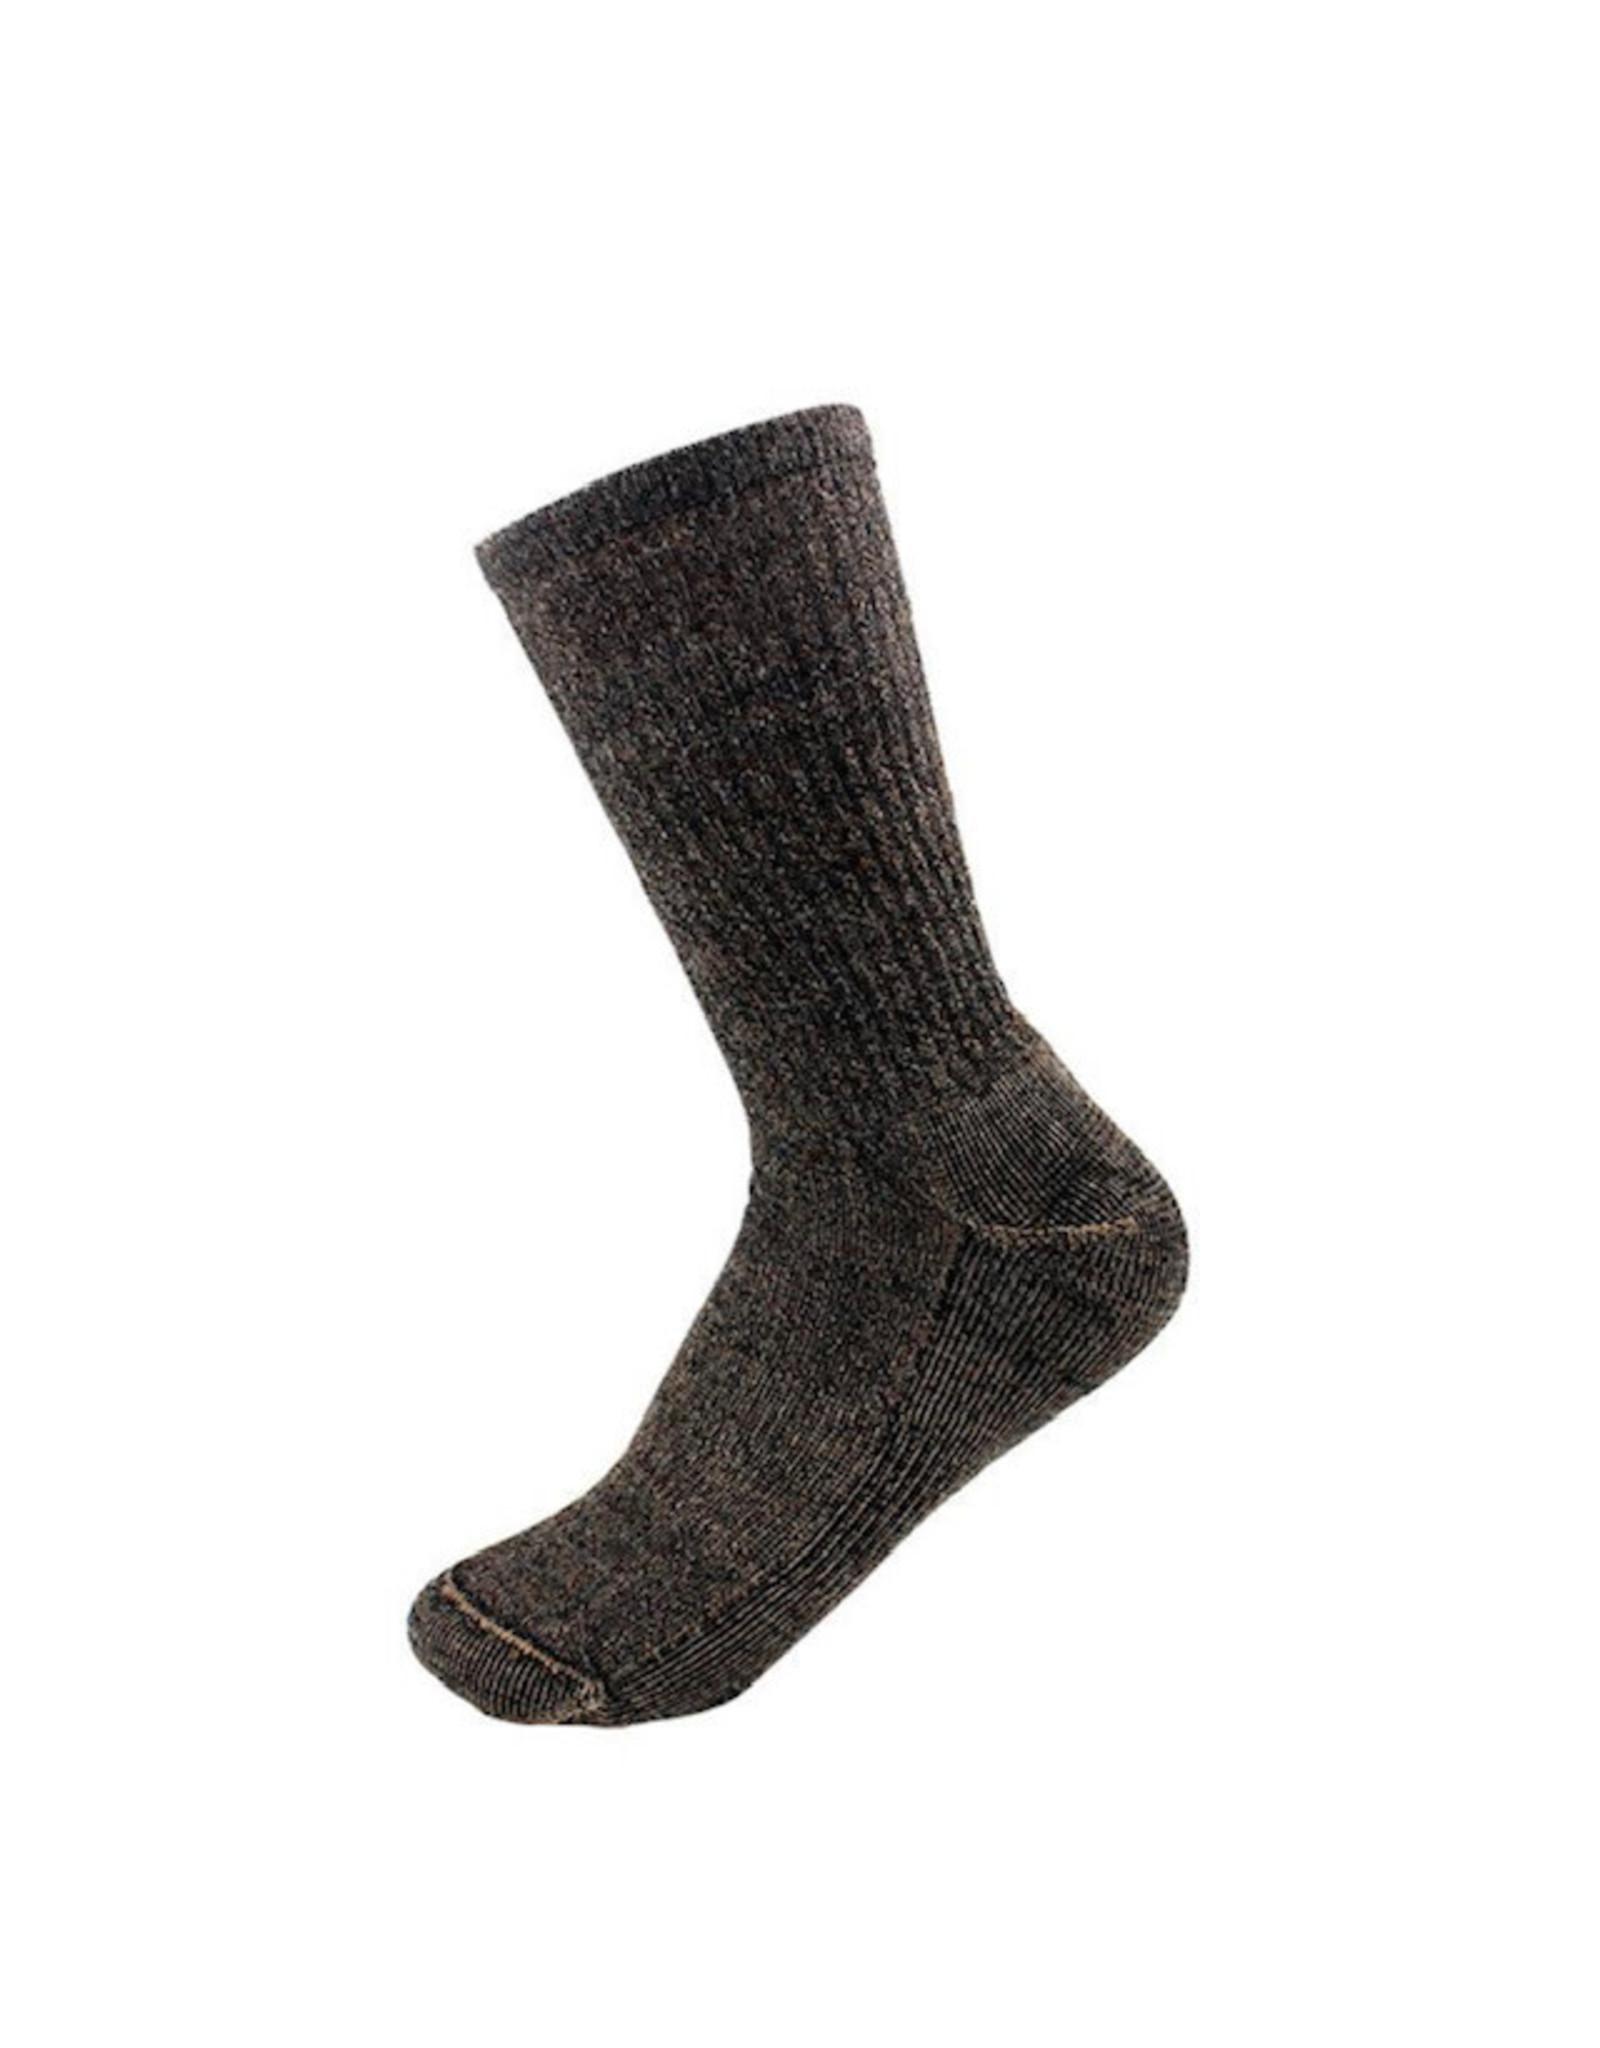 BACKPACA Medium Alpaca Sock- Lightweight  Sport Hiker